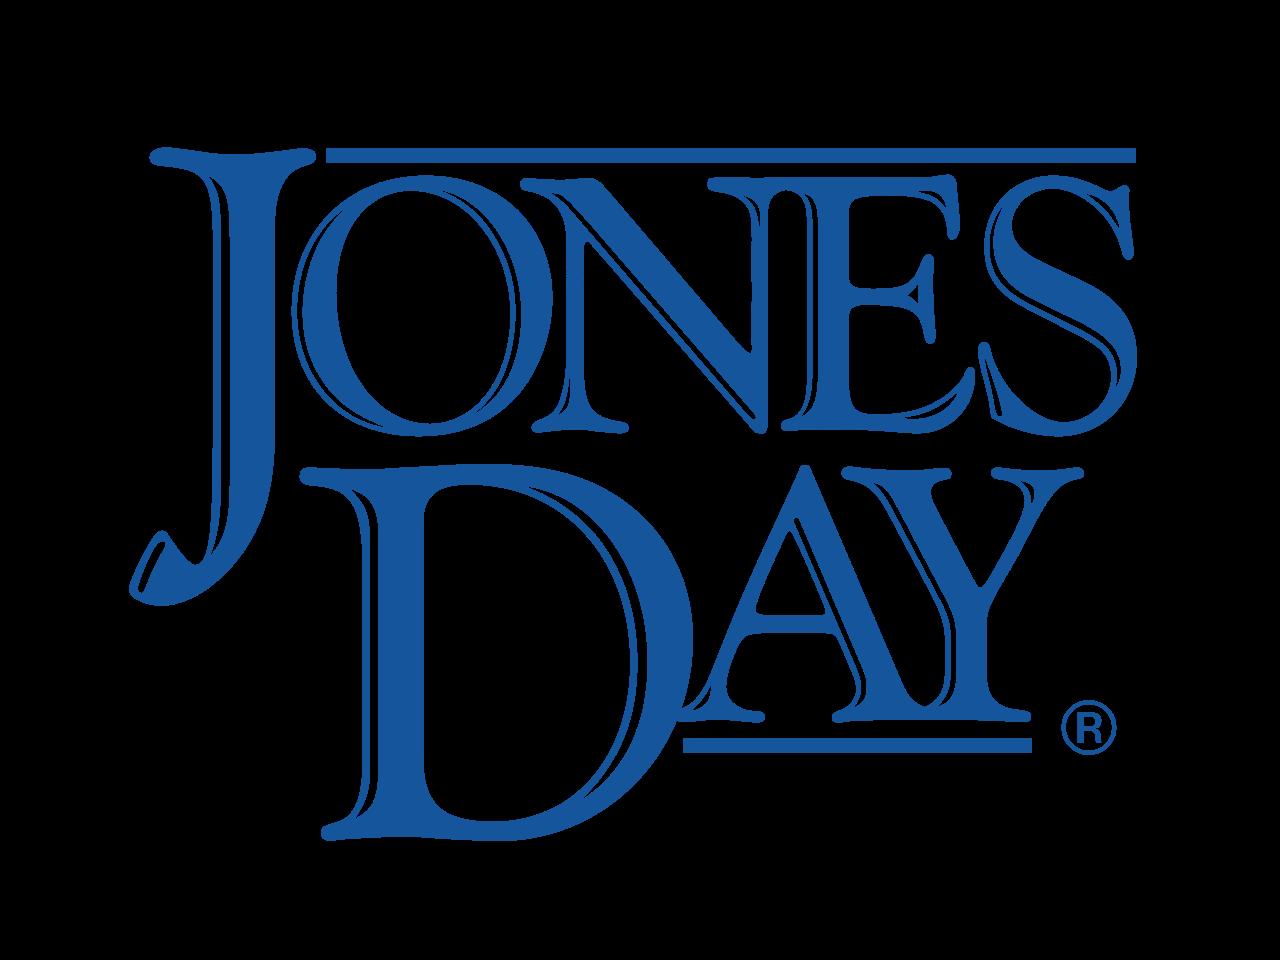 13b - Jones Day logo 04.29.15